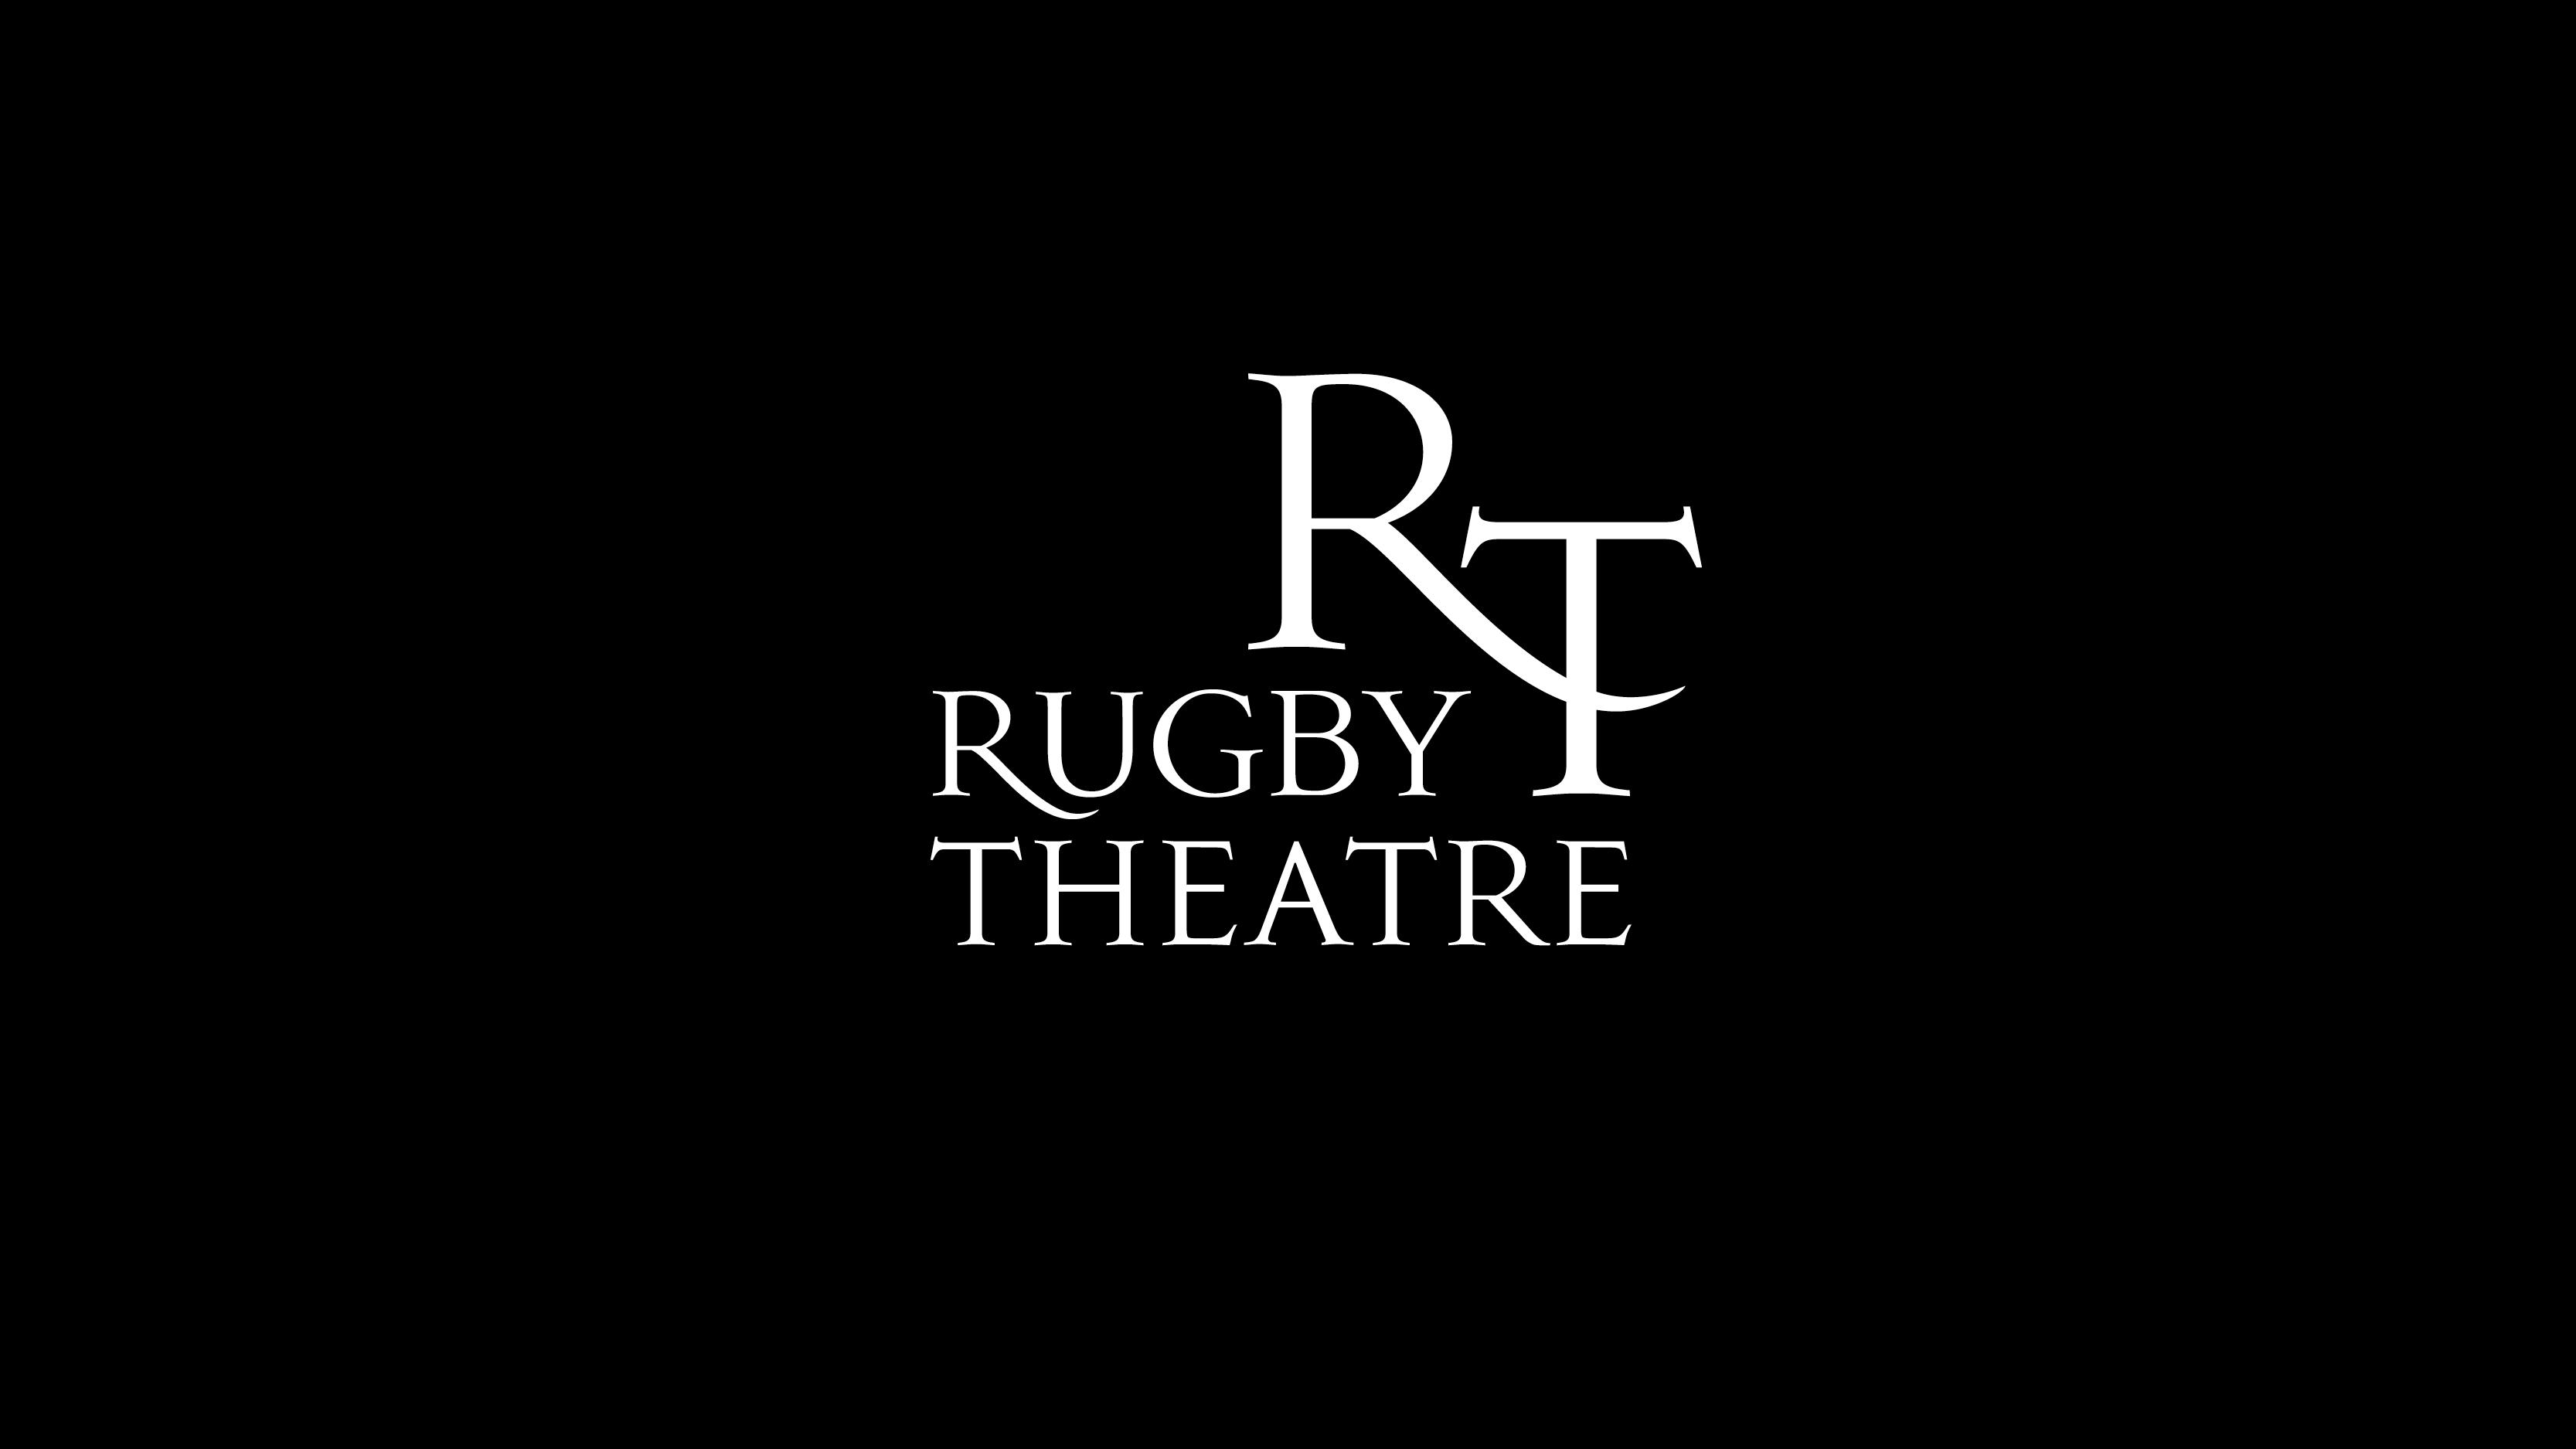 identity-design-theatre-branding-logo-milton-keynes-london-1